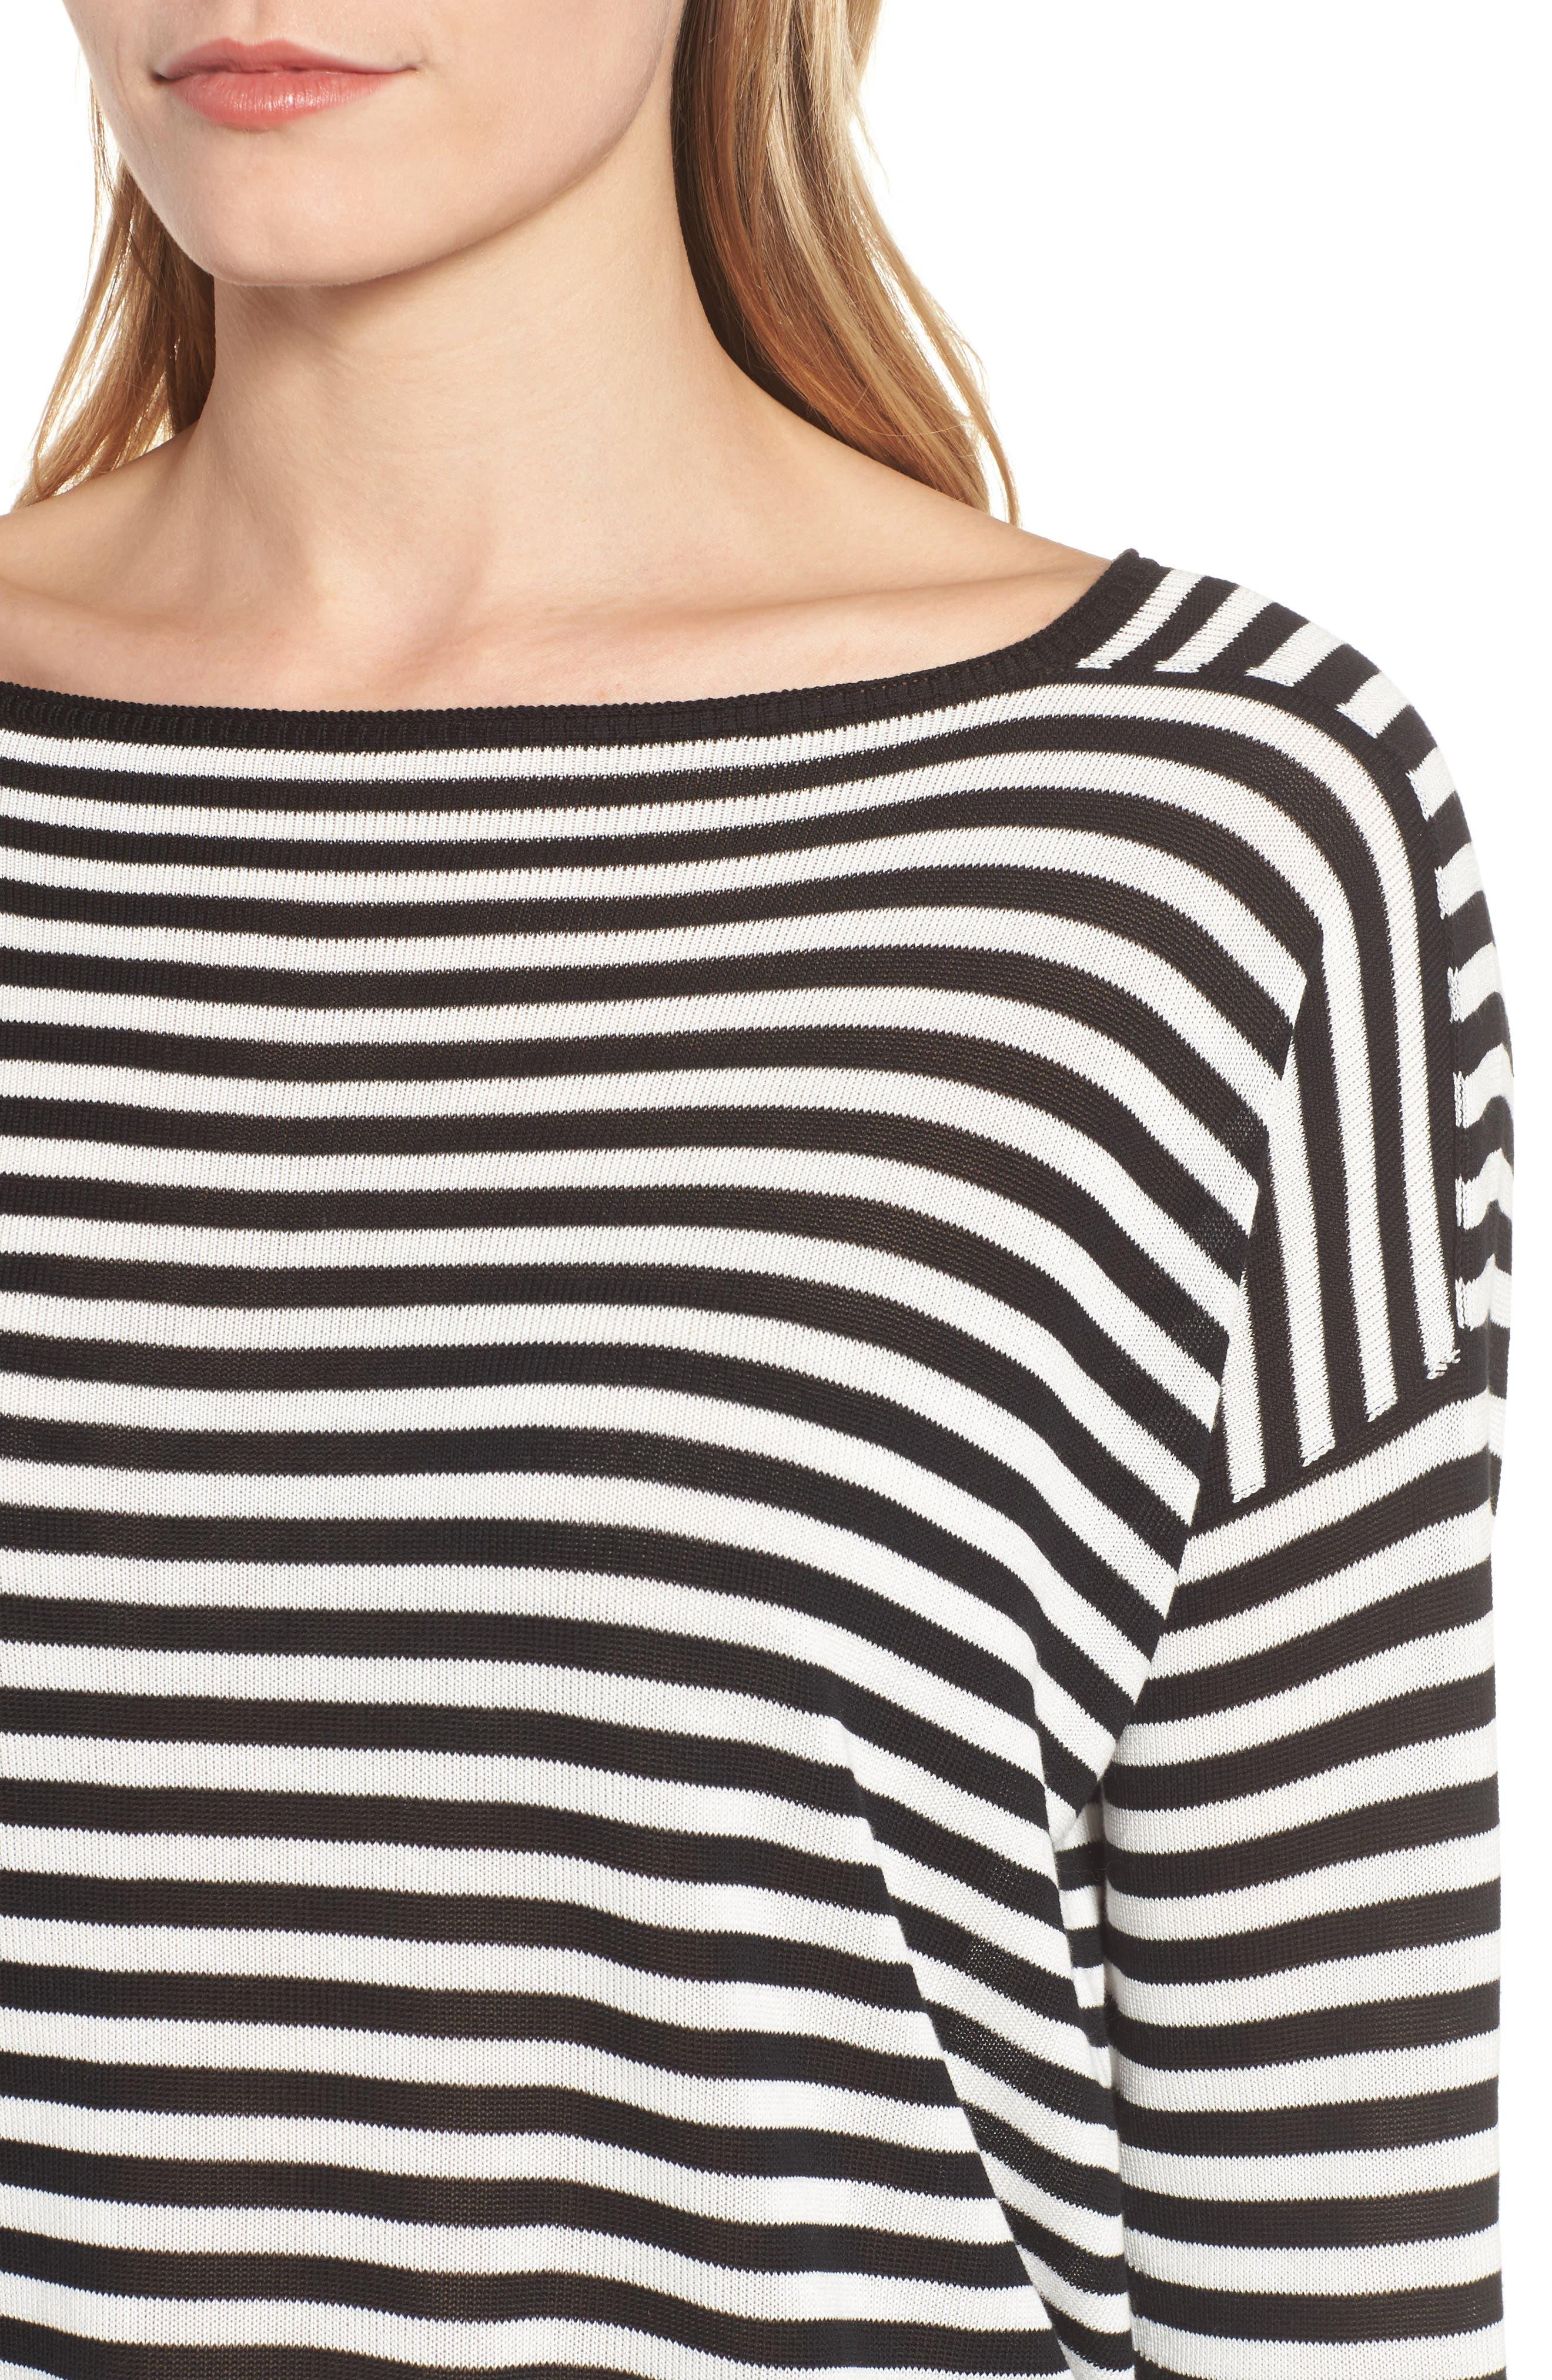 Stripe Tencel<sup>®</sup> Lyocell Knit Sweater,                             Alternate thumbnail 4, color,                             Black/ Soft White